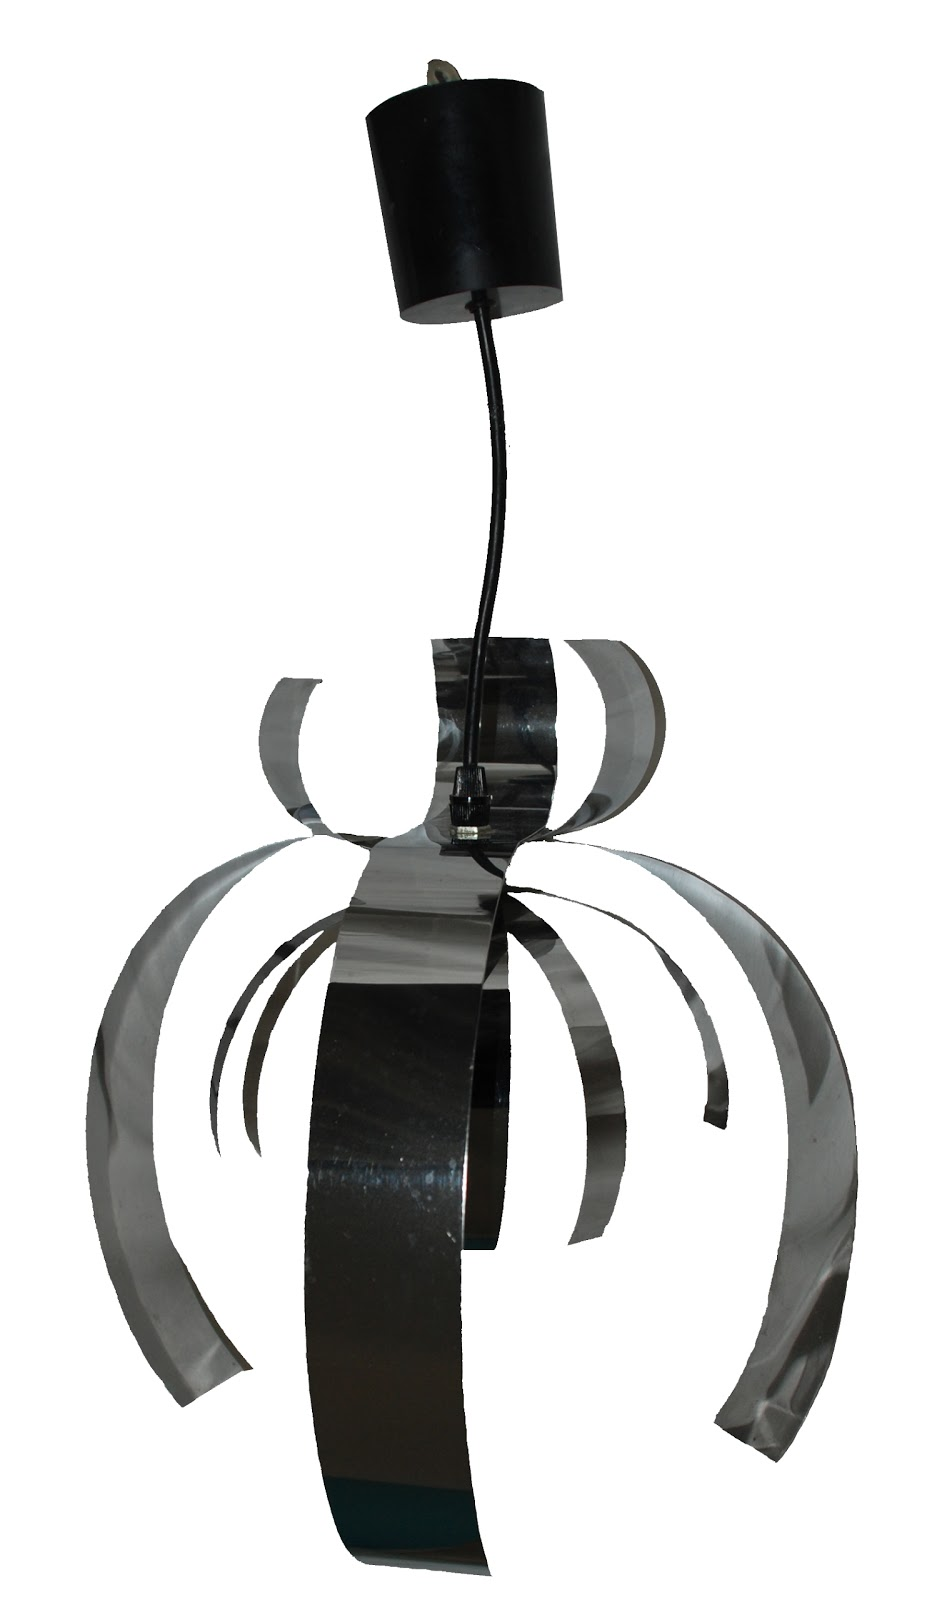 bo vintage suspension fleur araign e ann es 70. Black Bedroom Furniture Sets. Home Design Ideas